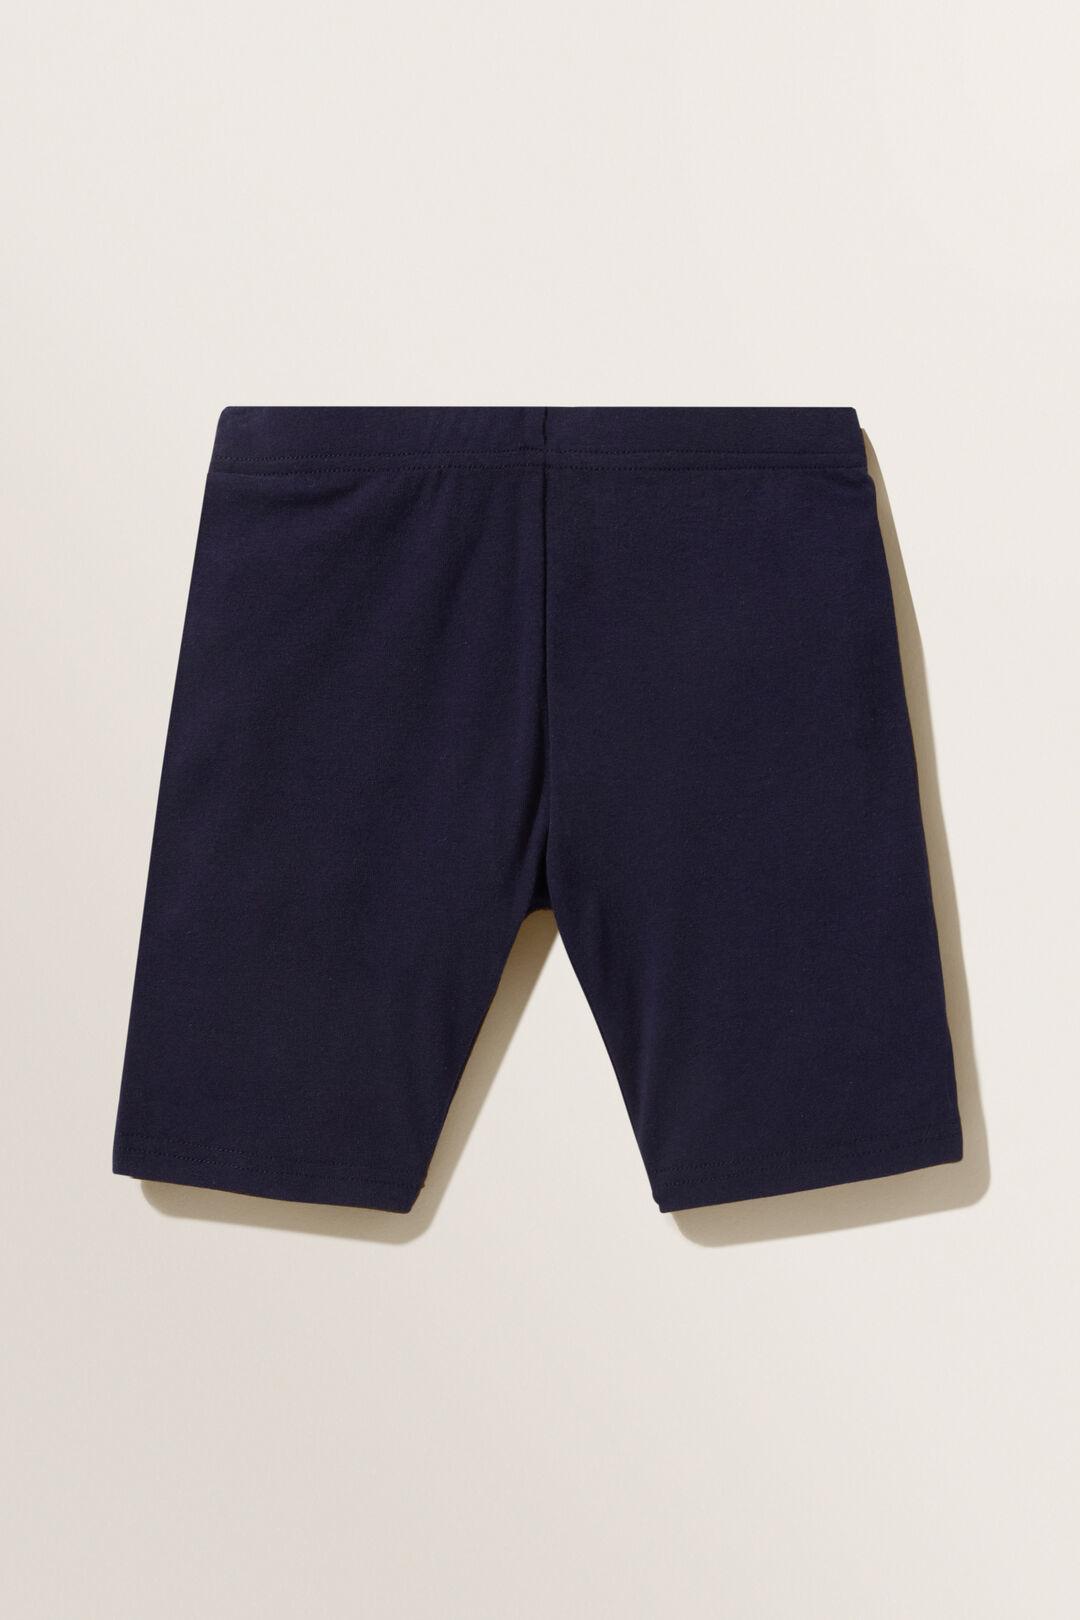 Bike Shorts  Midnight  hi-res